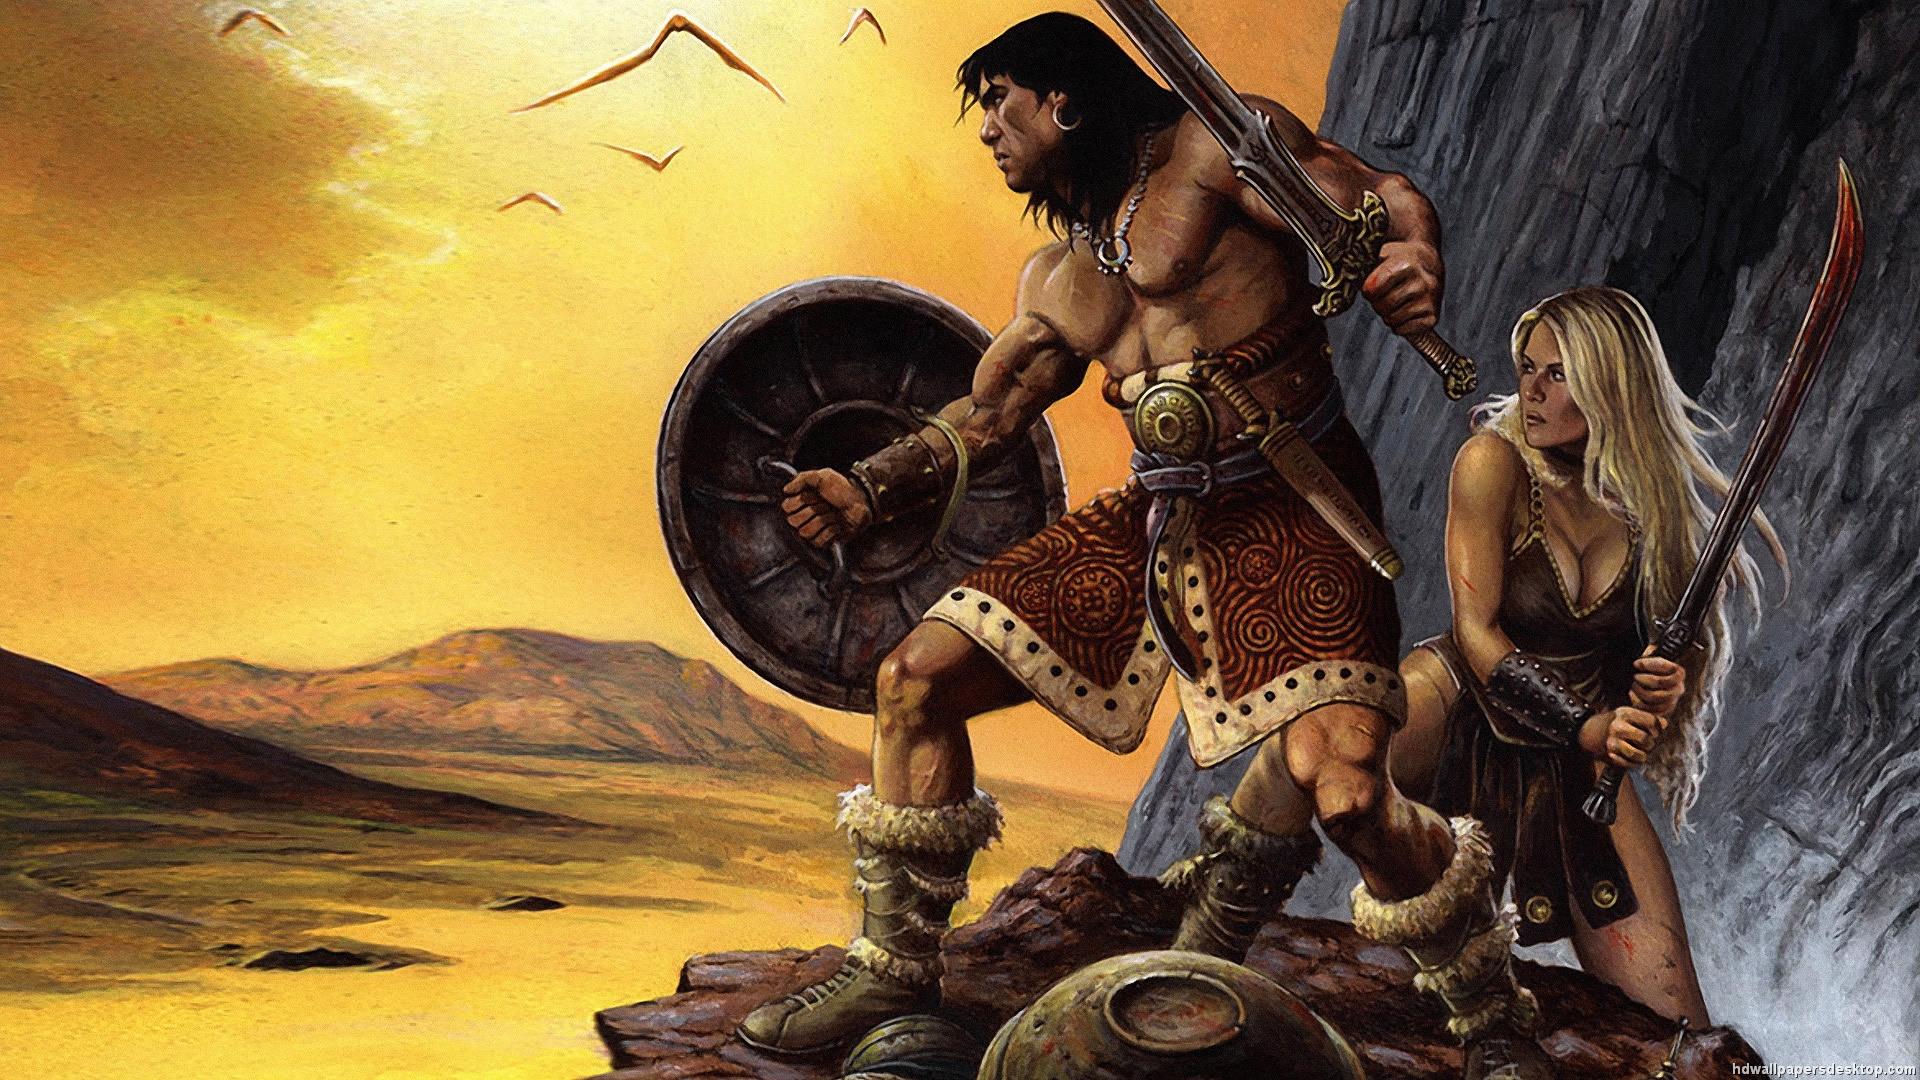 Conan the Barbarian Wallpaper Conan Red Sonja Wallpaper 1920x1080